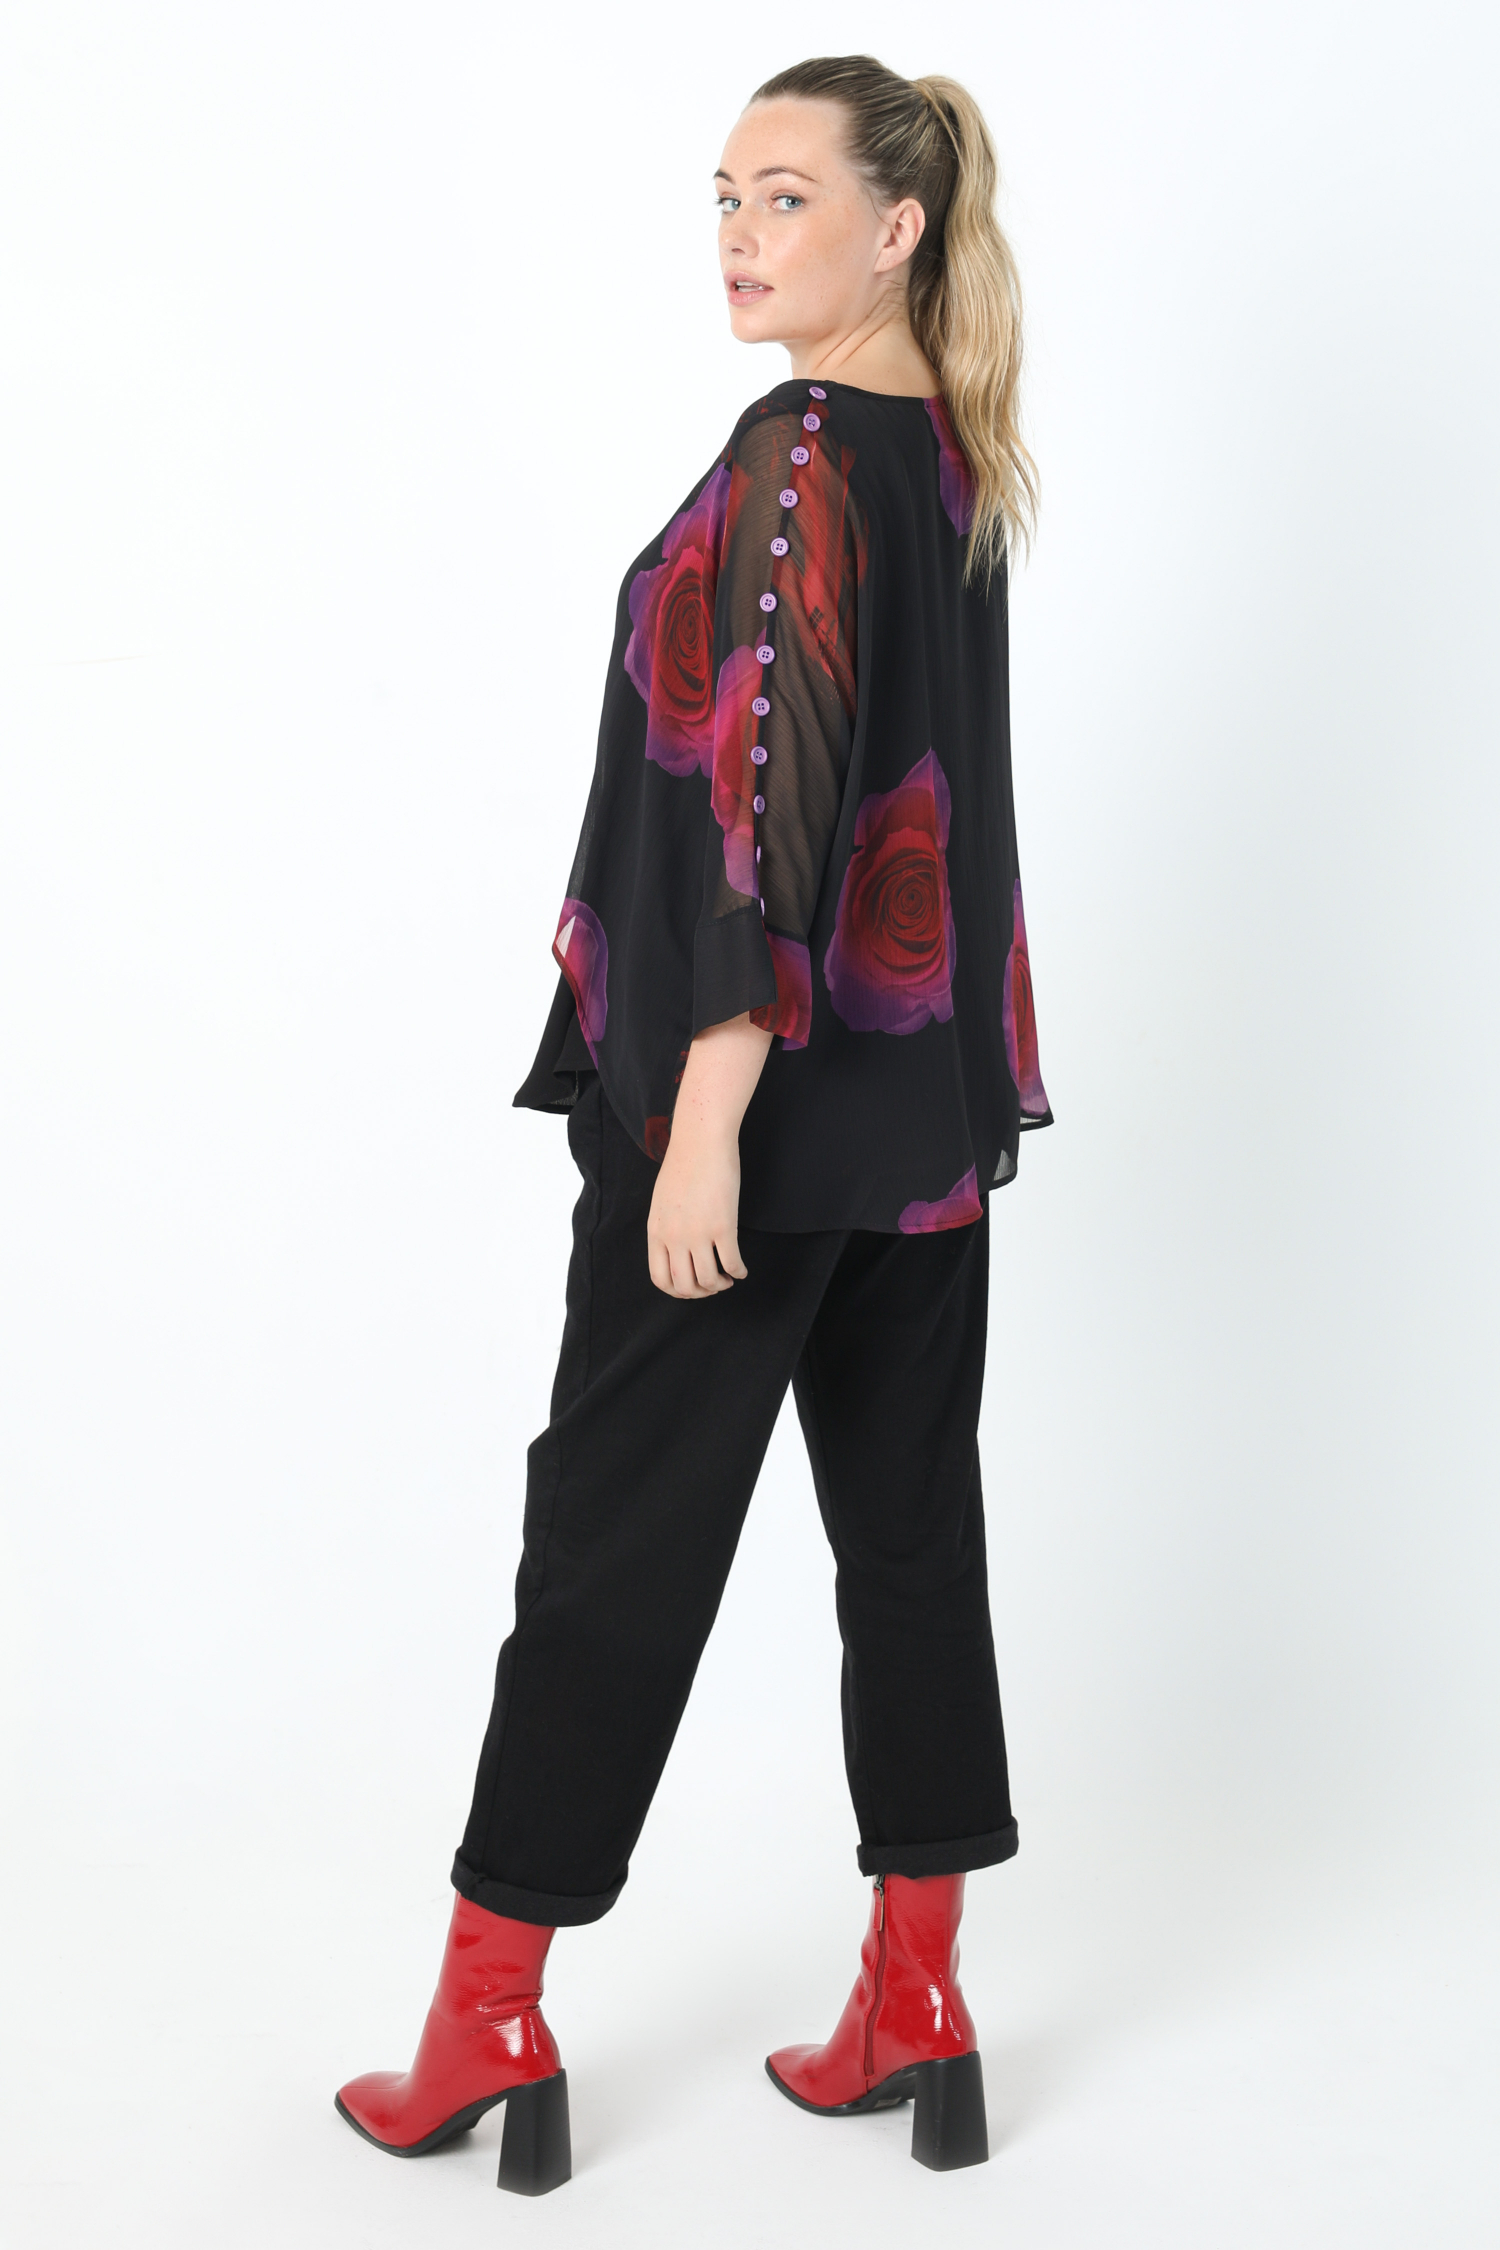 Overlay blouse in veil printed with oeko-tex fabrics